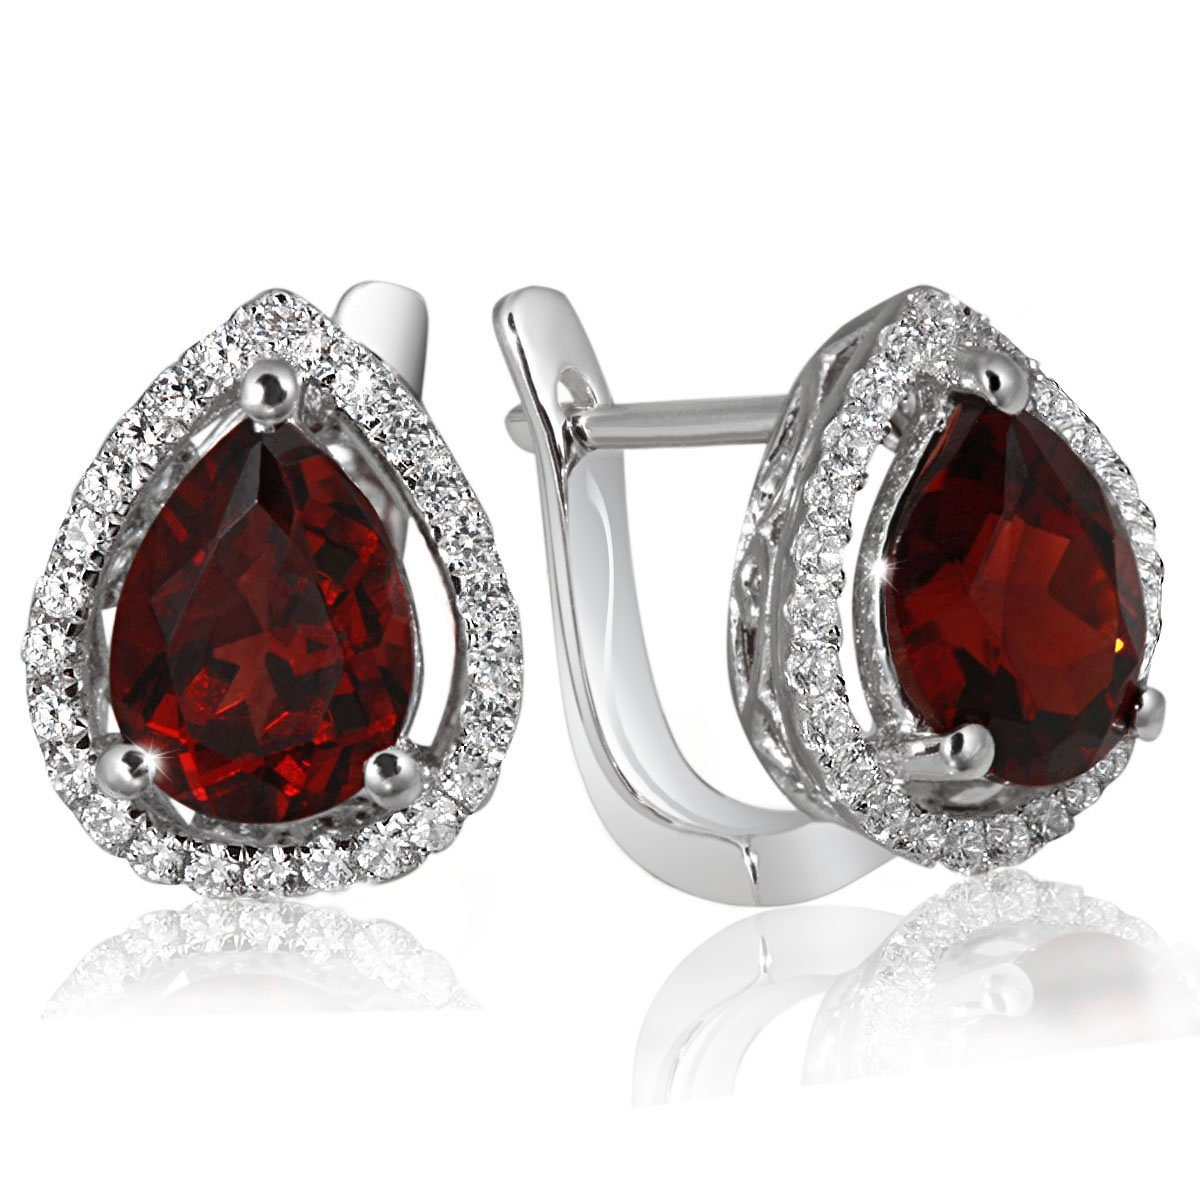 goldmaid Paar Ohrringe Silber 925/- Granate Tropfen Zirkonia PremiumShine